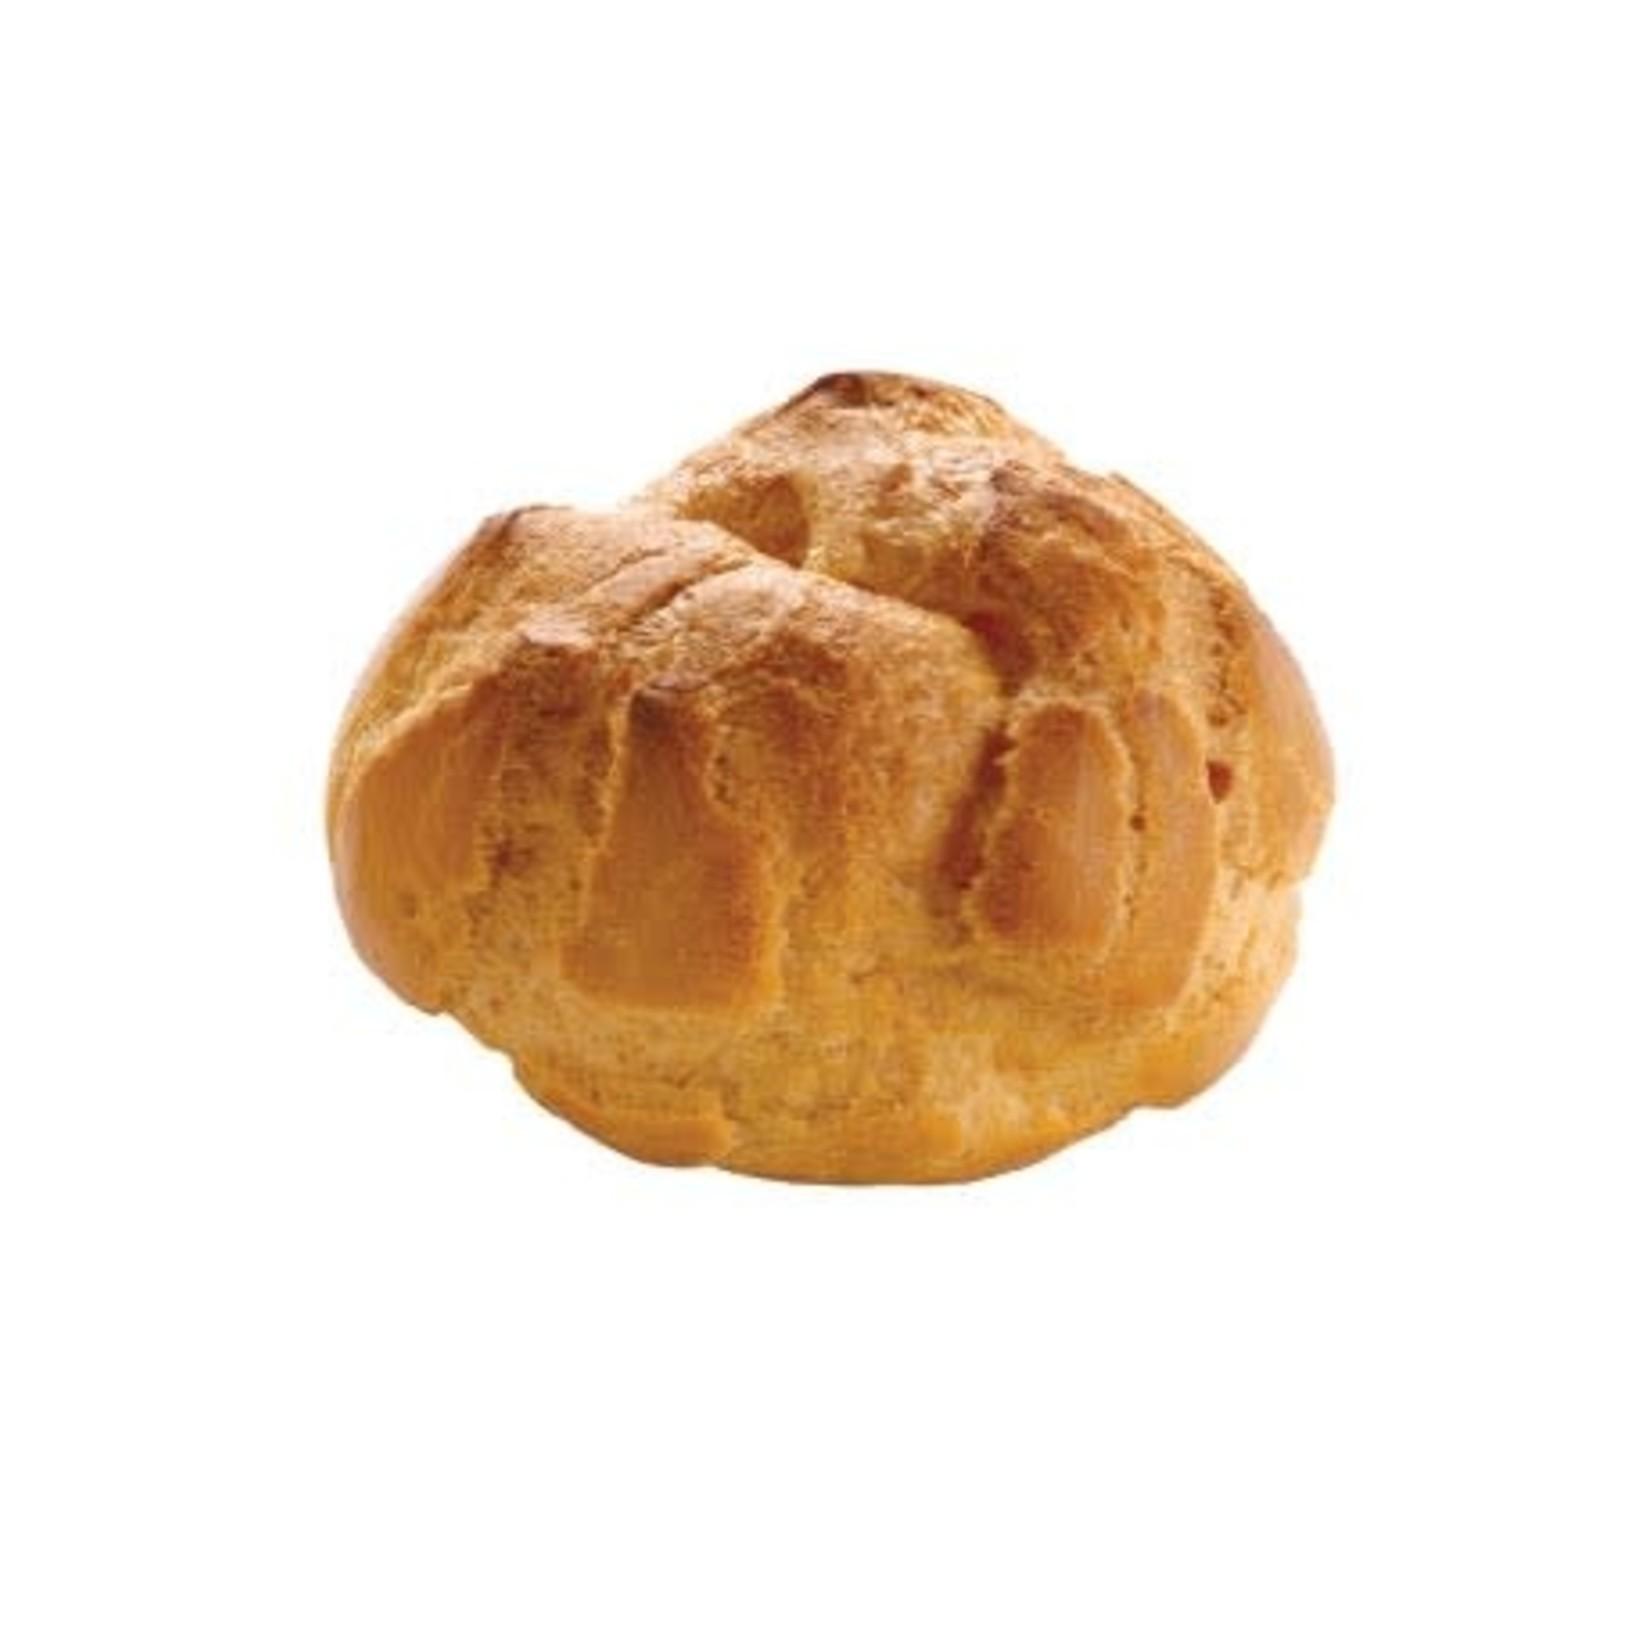 Pidy Pidy - Cream Puff, Large - 3.5'' (80ct), 835.50.080US